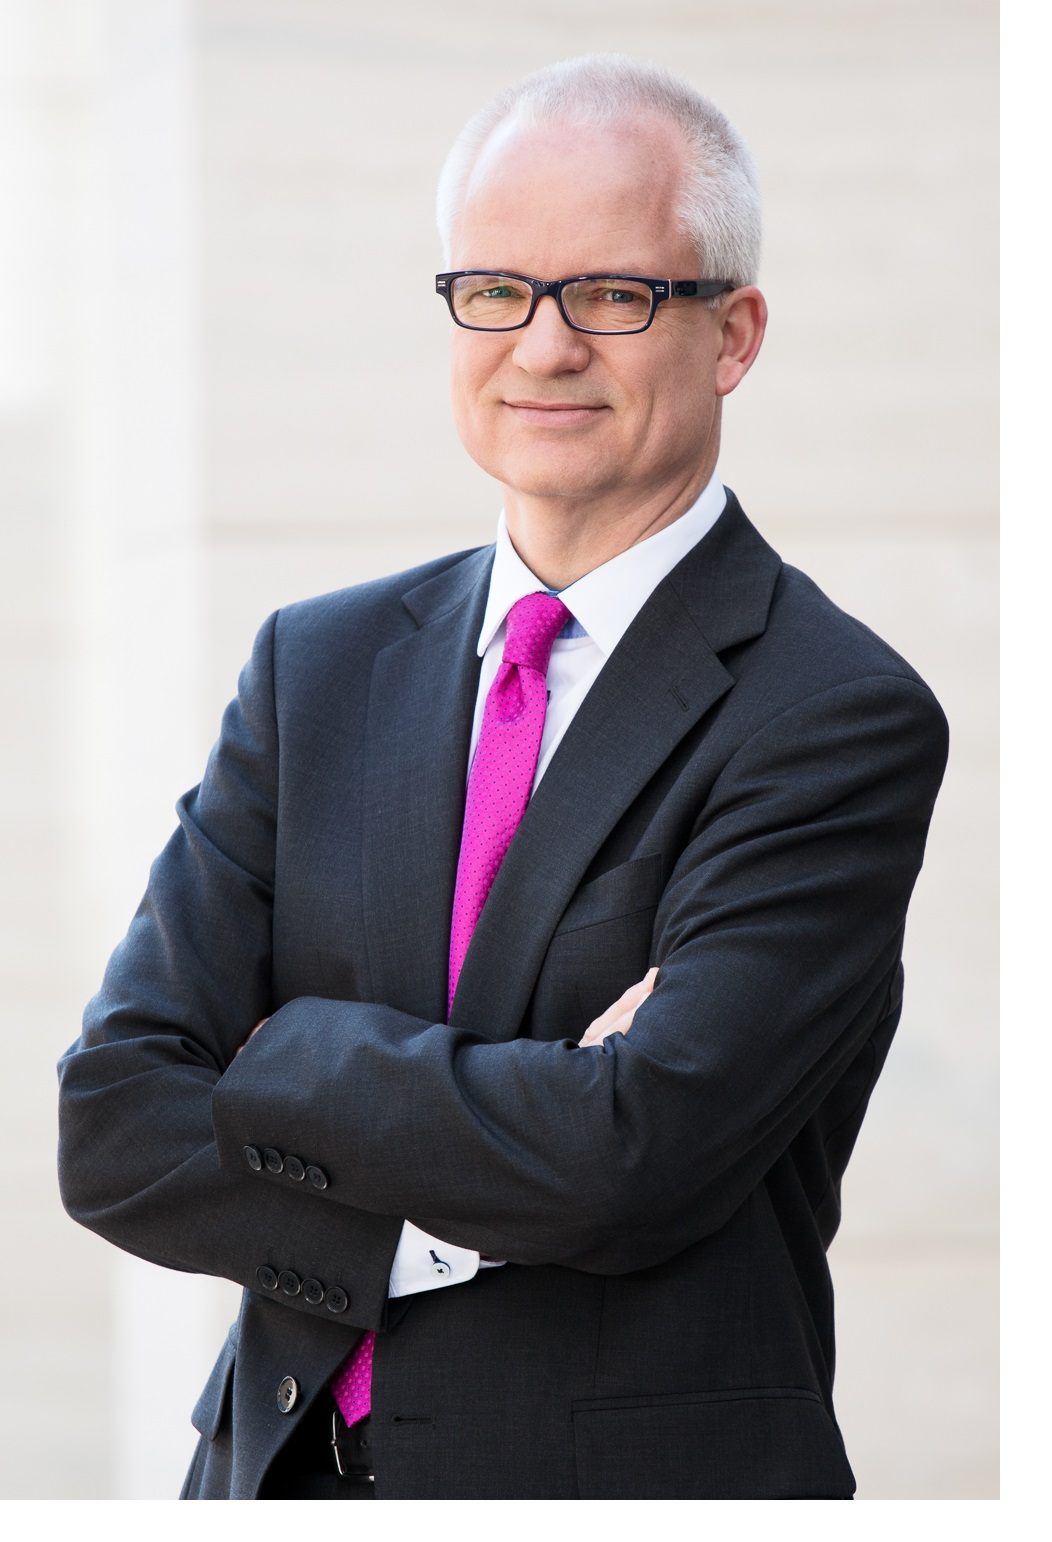 Prof. Dr. Dirk Soehnholz / Interview mit Robo Advisor Diversifikator / Robo Advice / Robo Advisory 2020